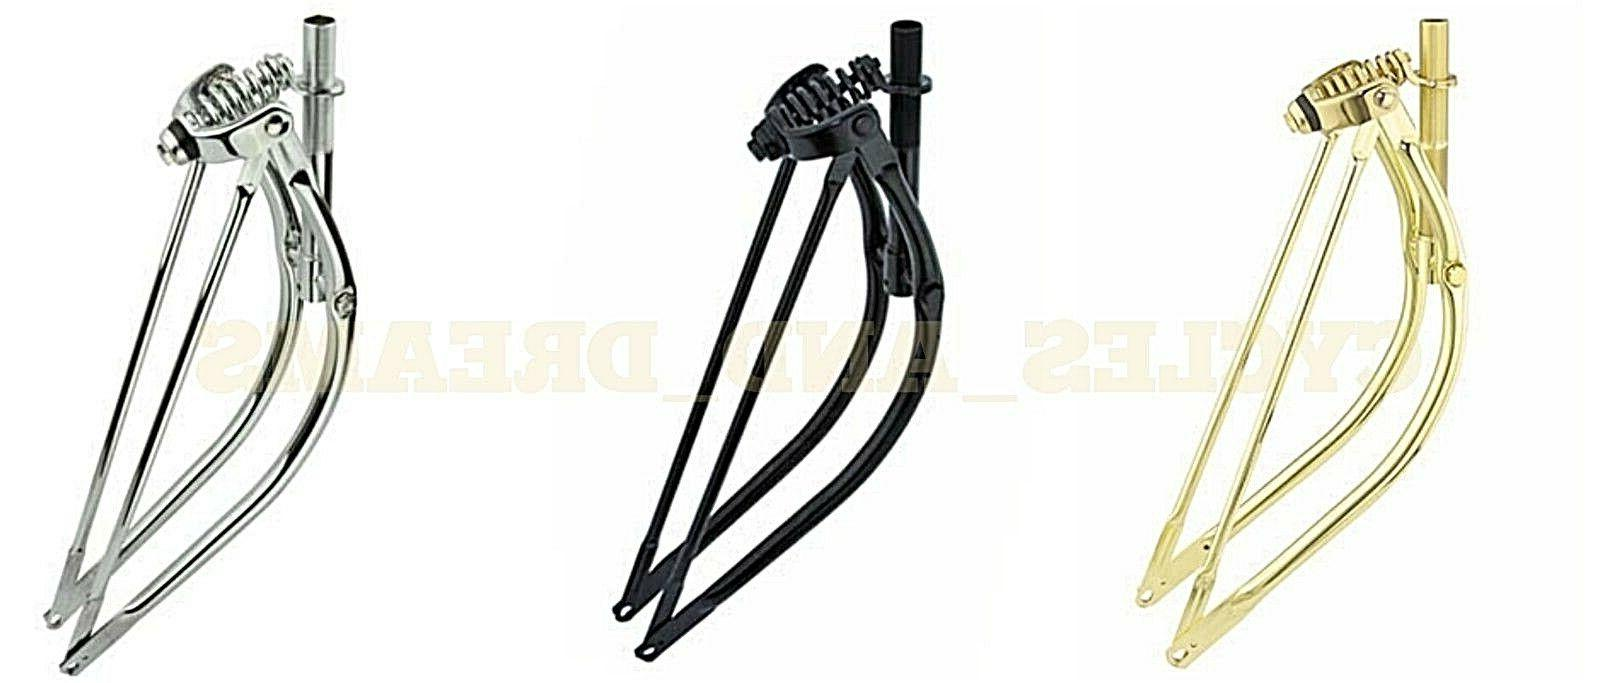 new bicycle bike 26 bent spring fork